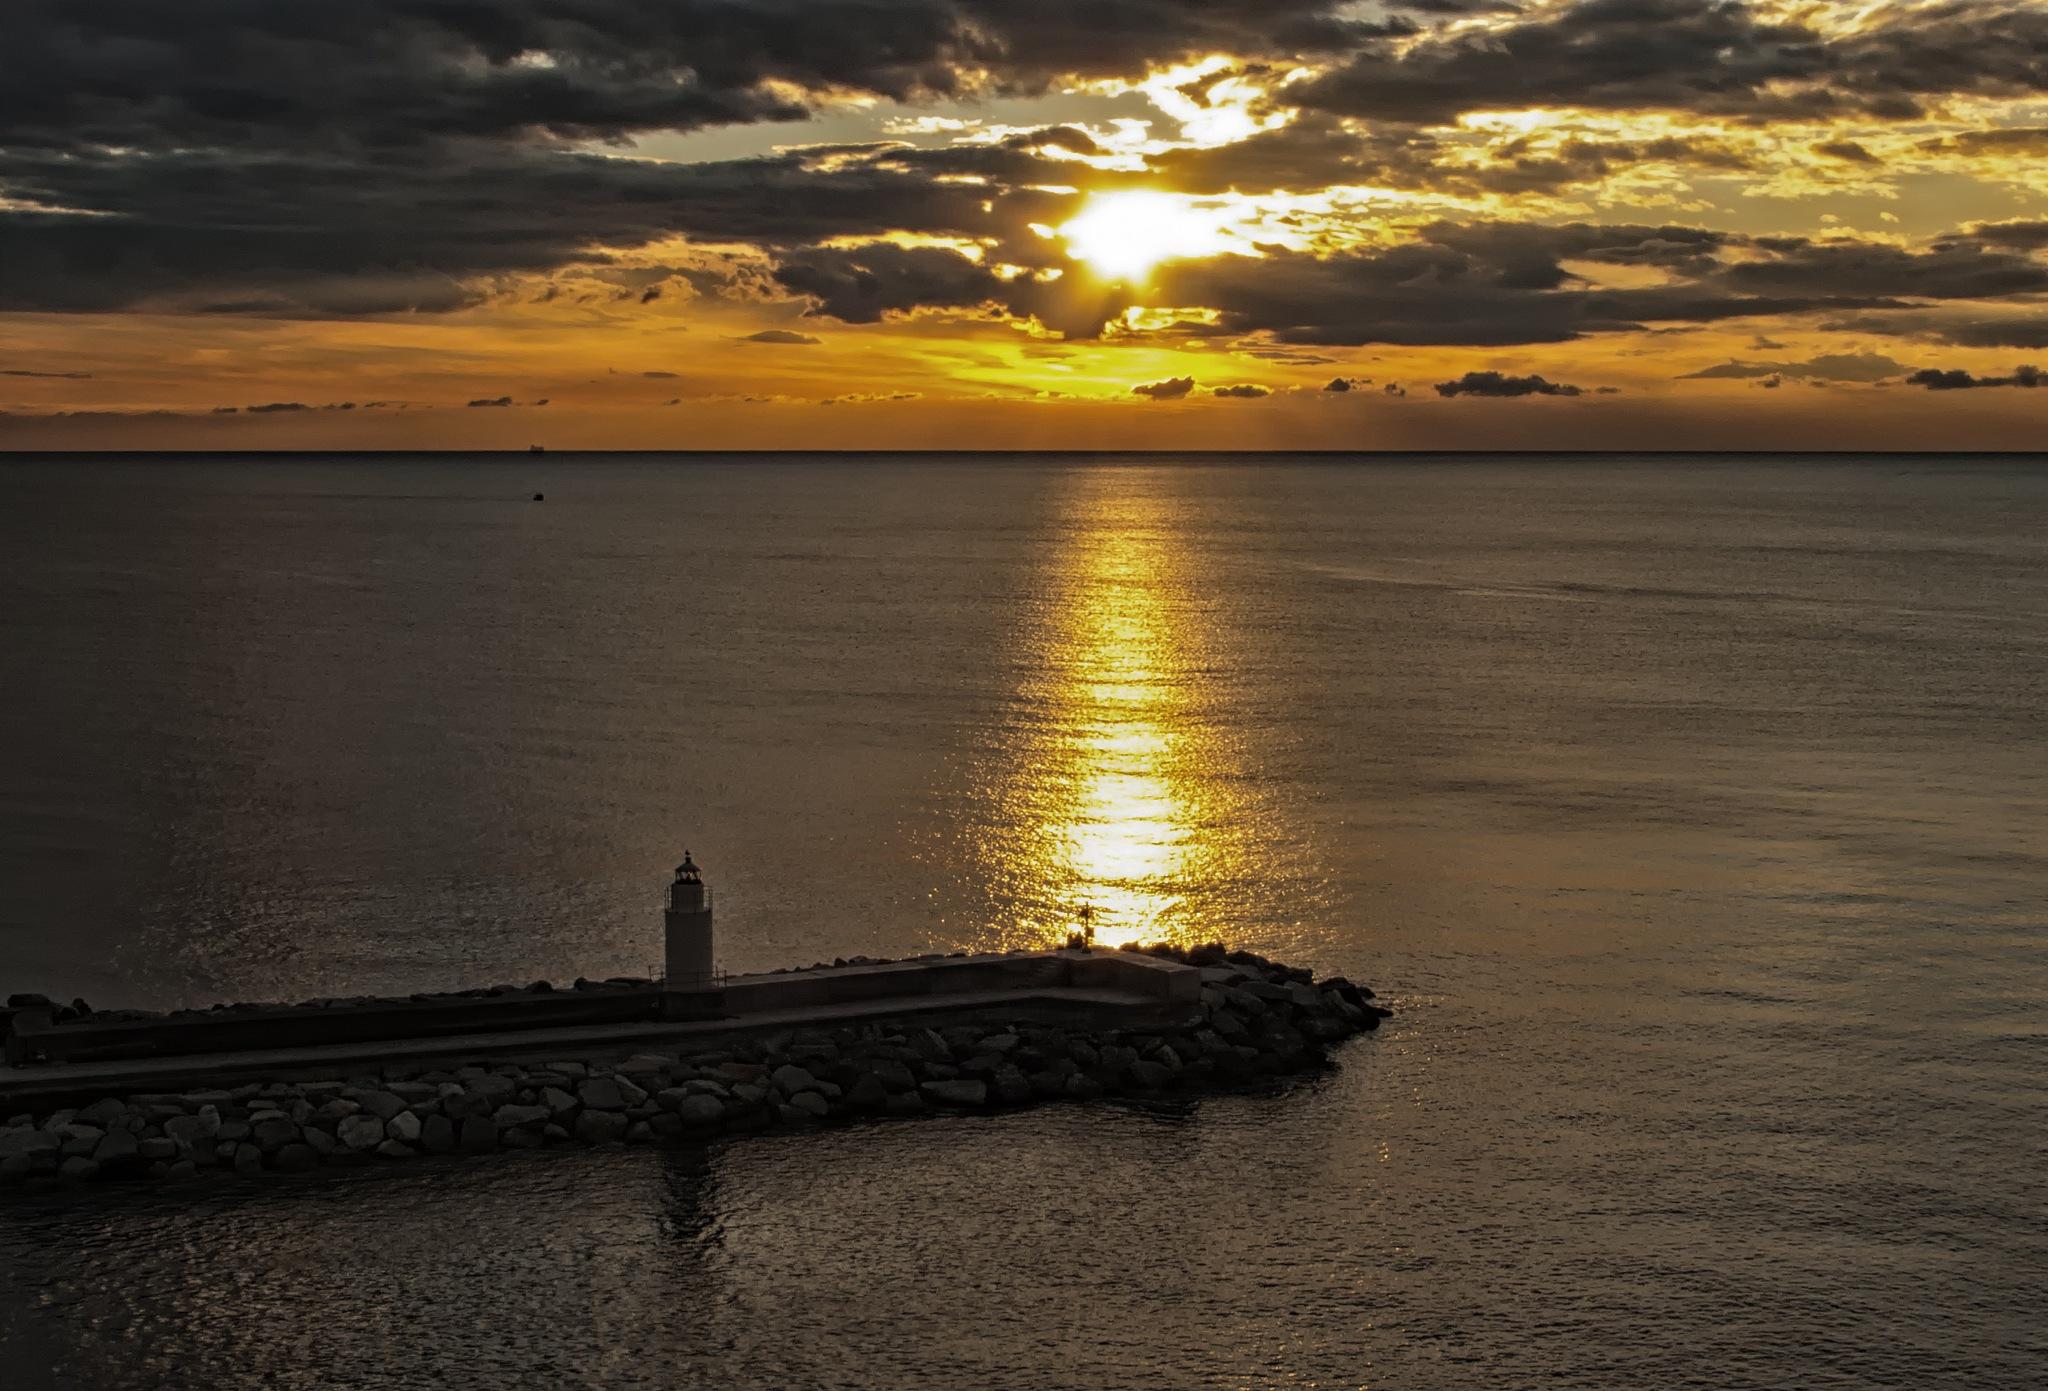 sunset on the lighthouse by sunrisesunset